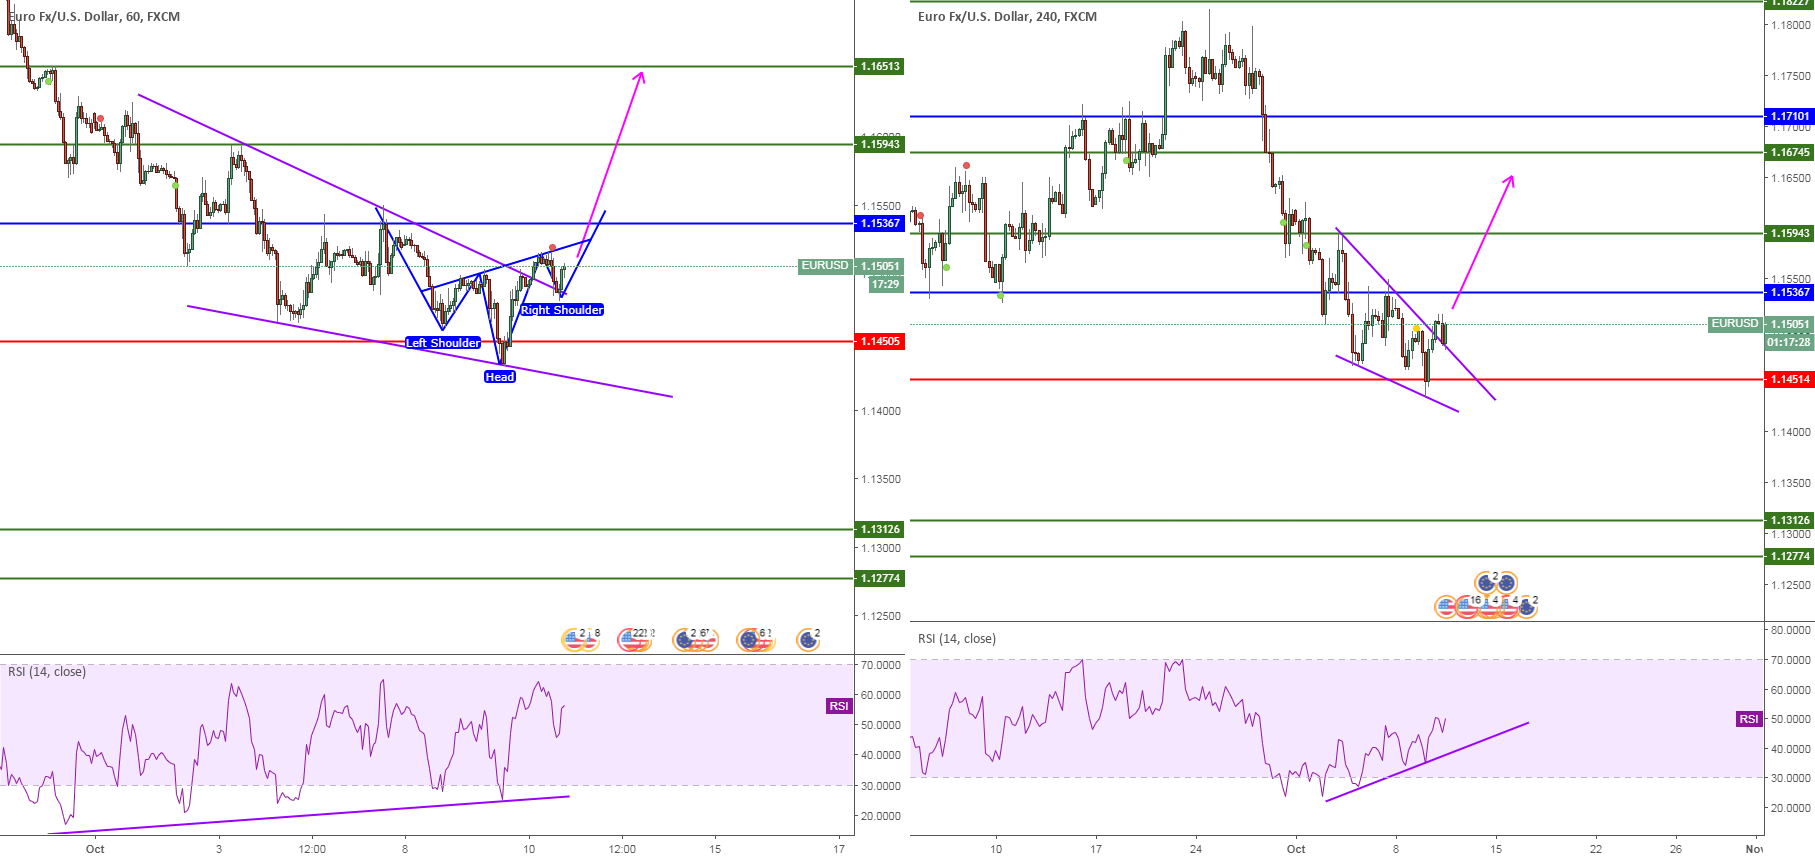 EURUSD, H-S&RSI Divergence&TrendLineBreak, 1H-4H, Buy